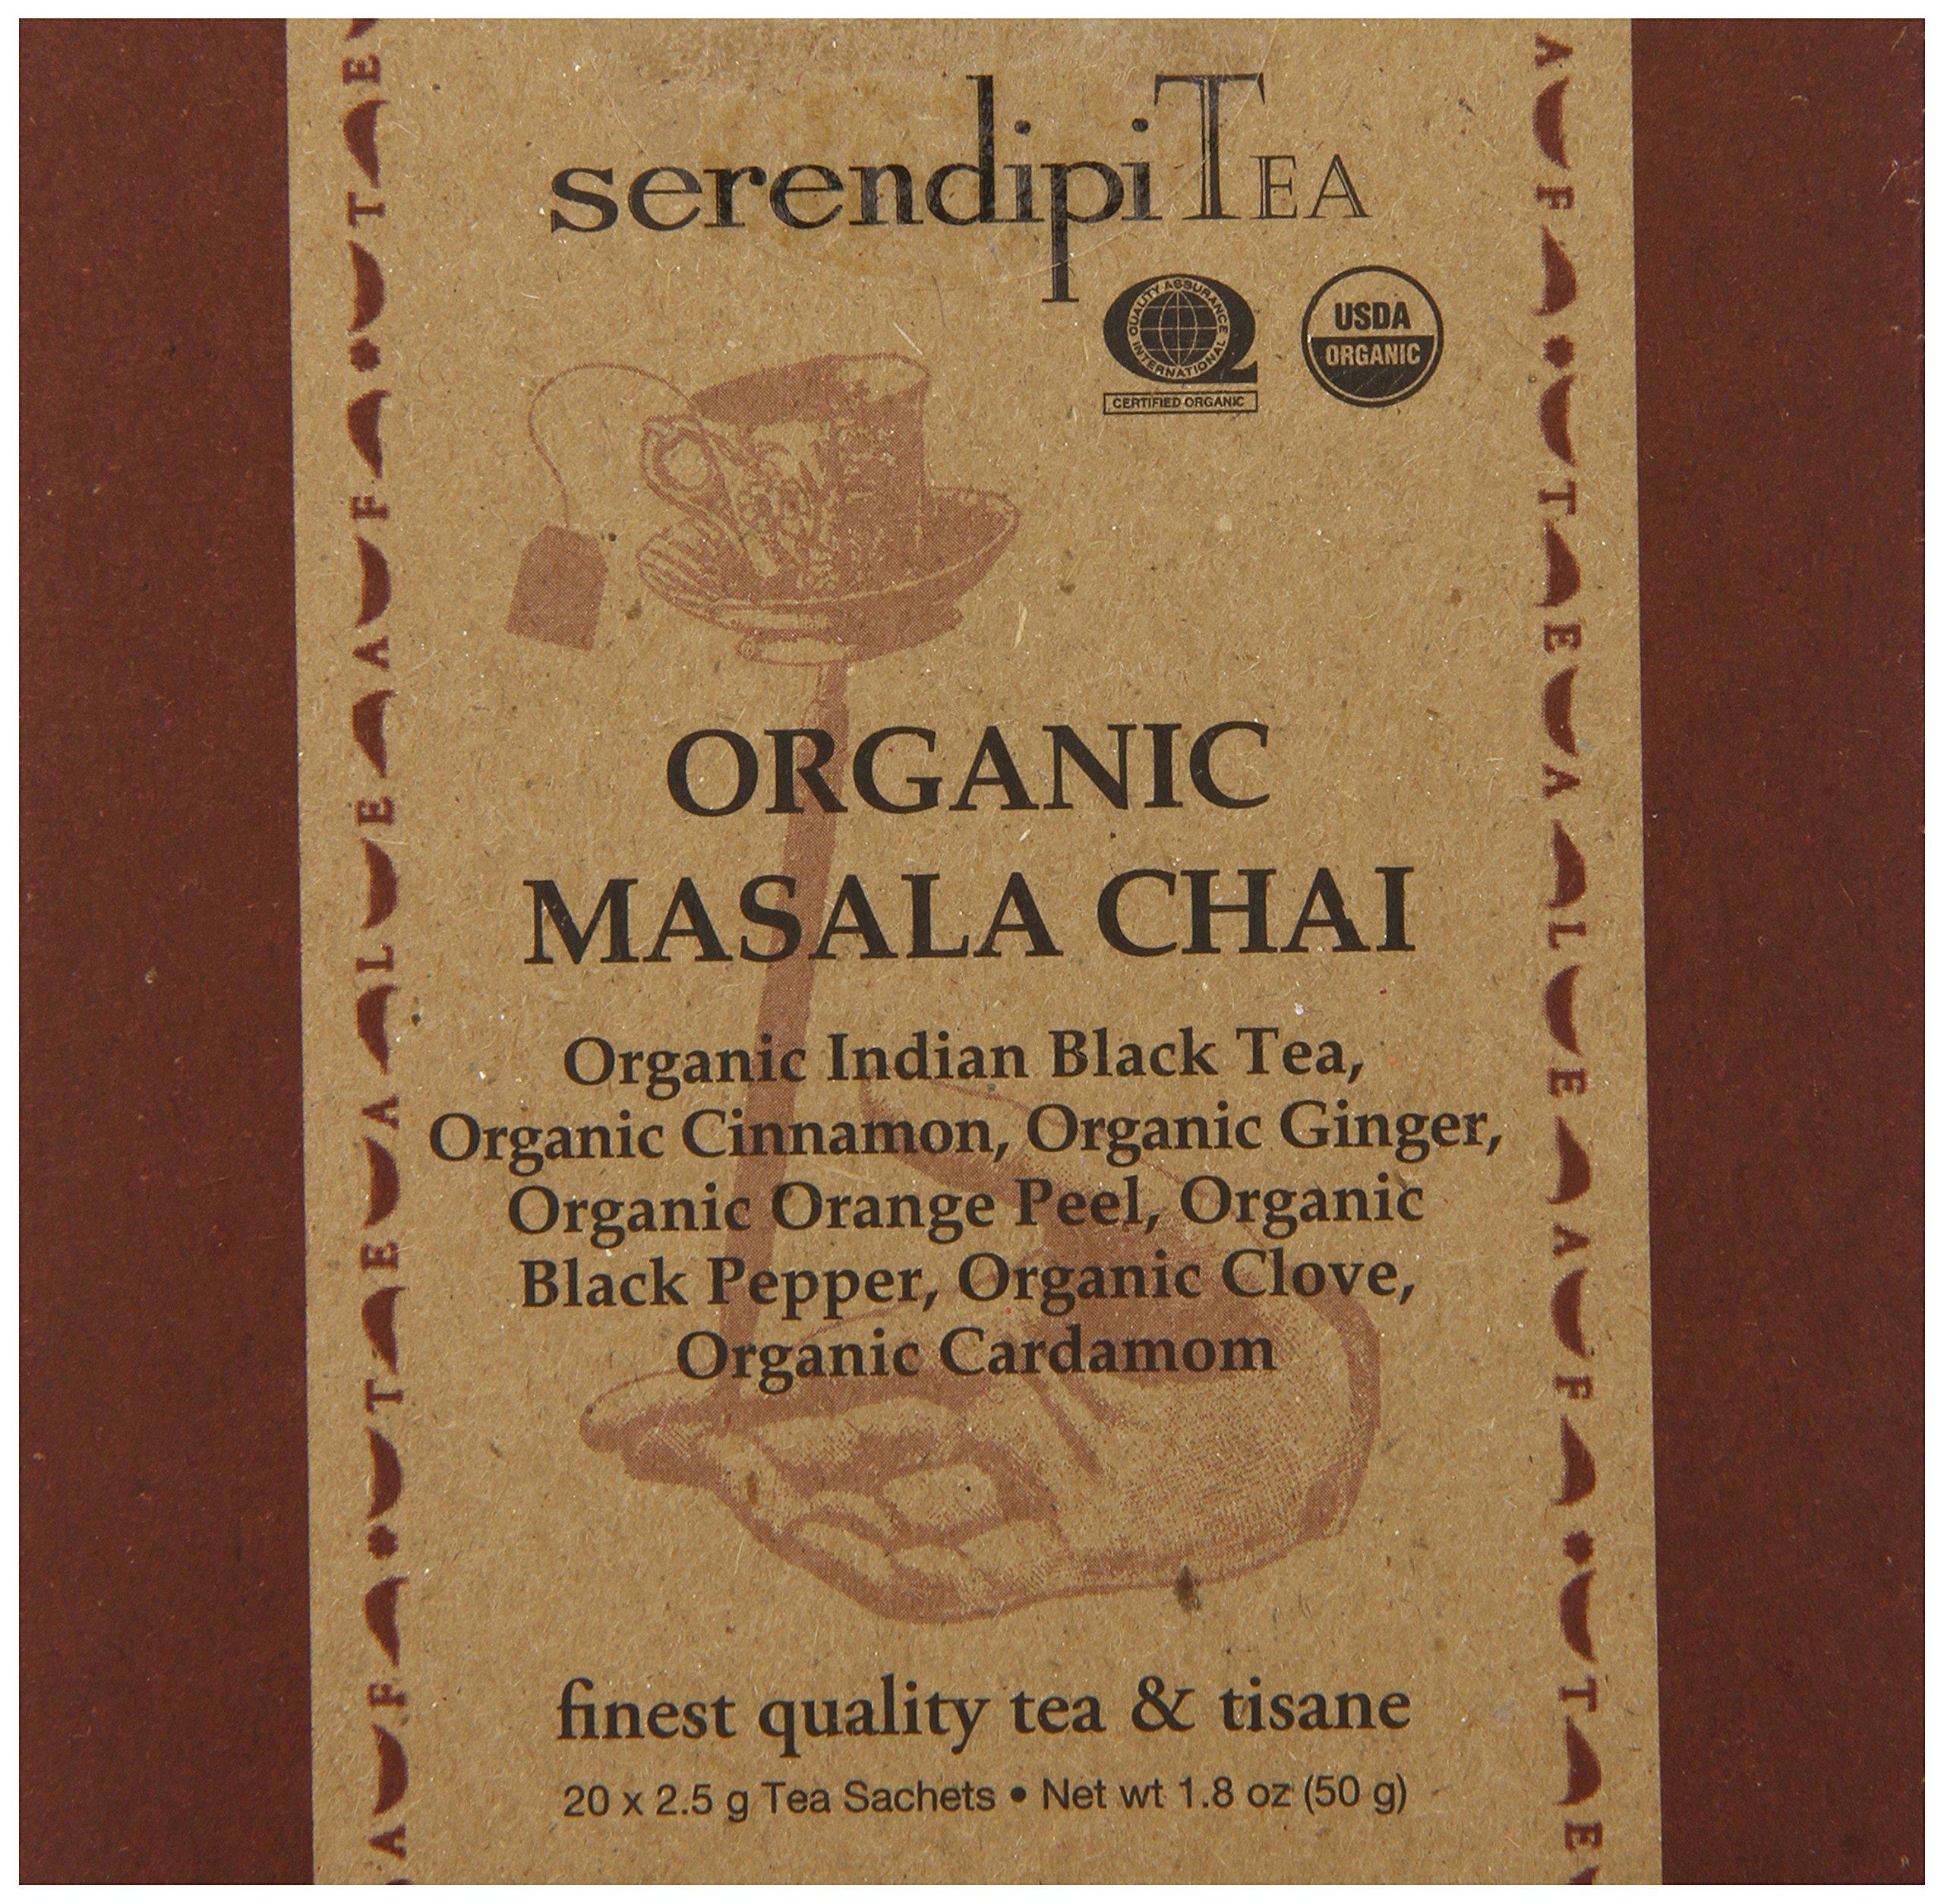 SerendipiTea Organic Tea Masala Chai, 20 Count (Pack of 8)